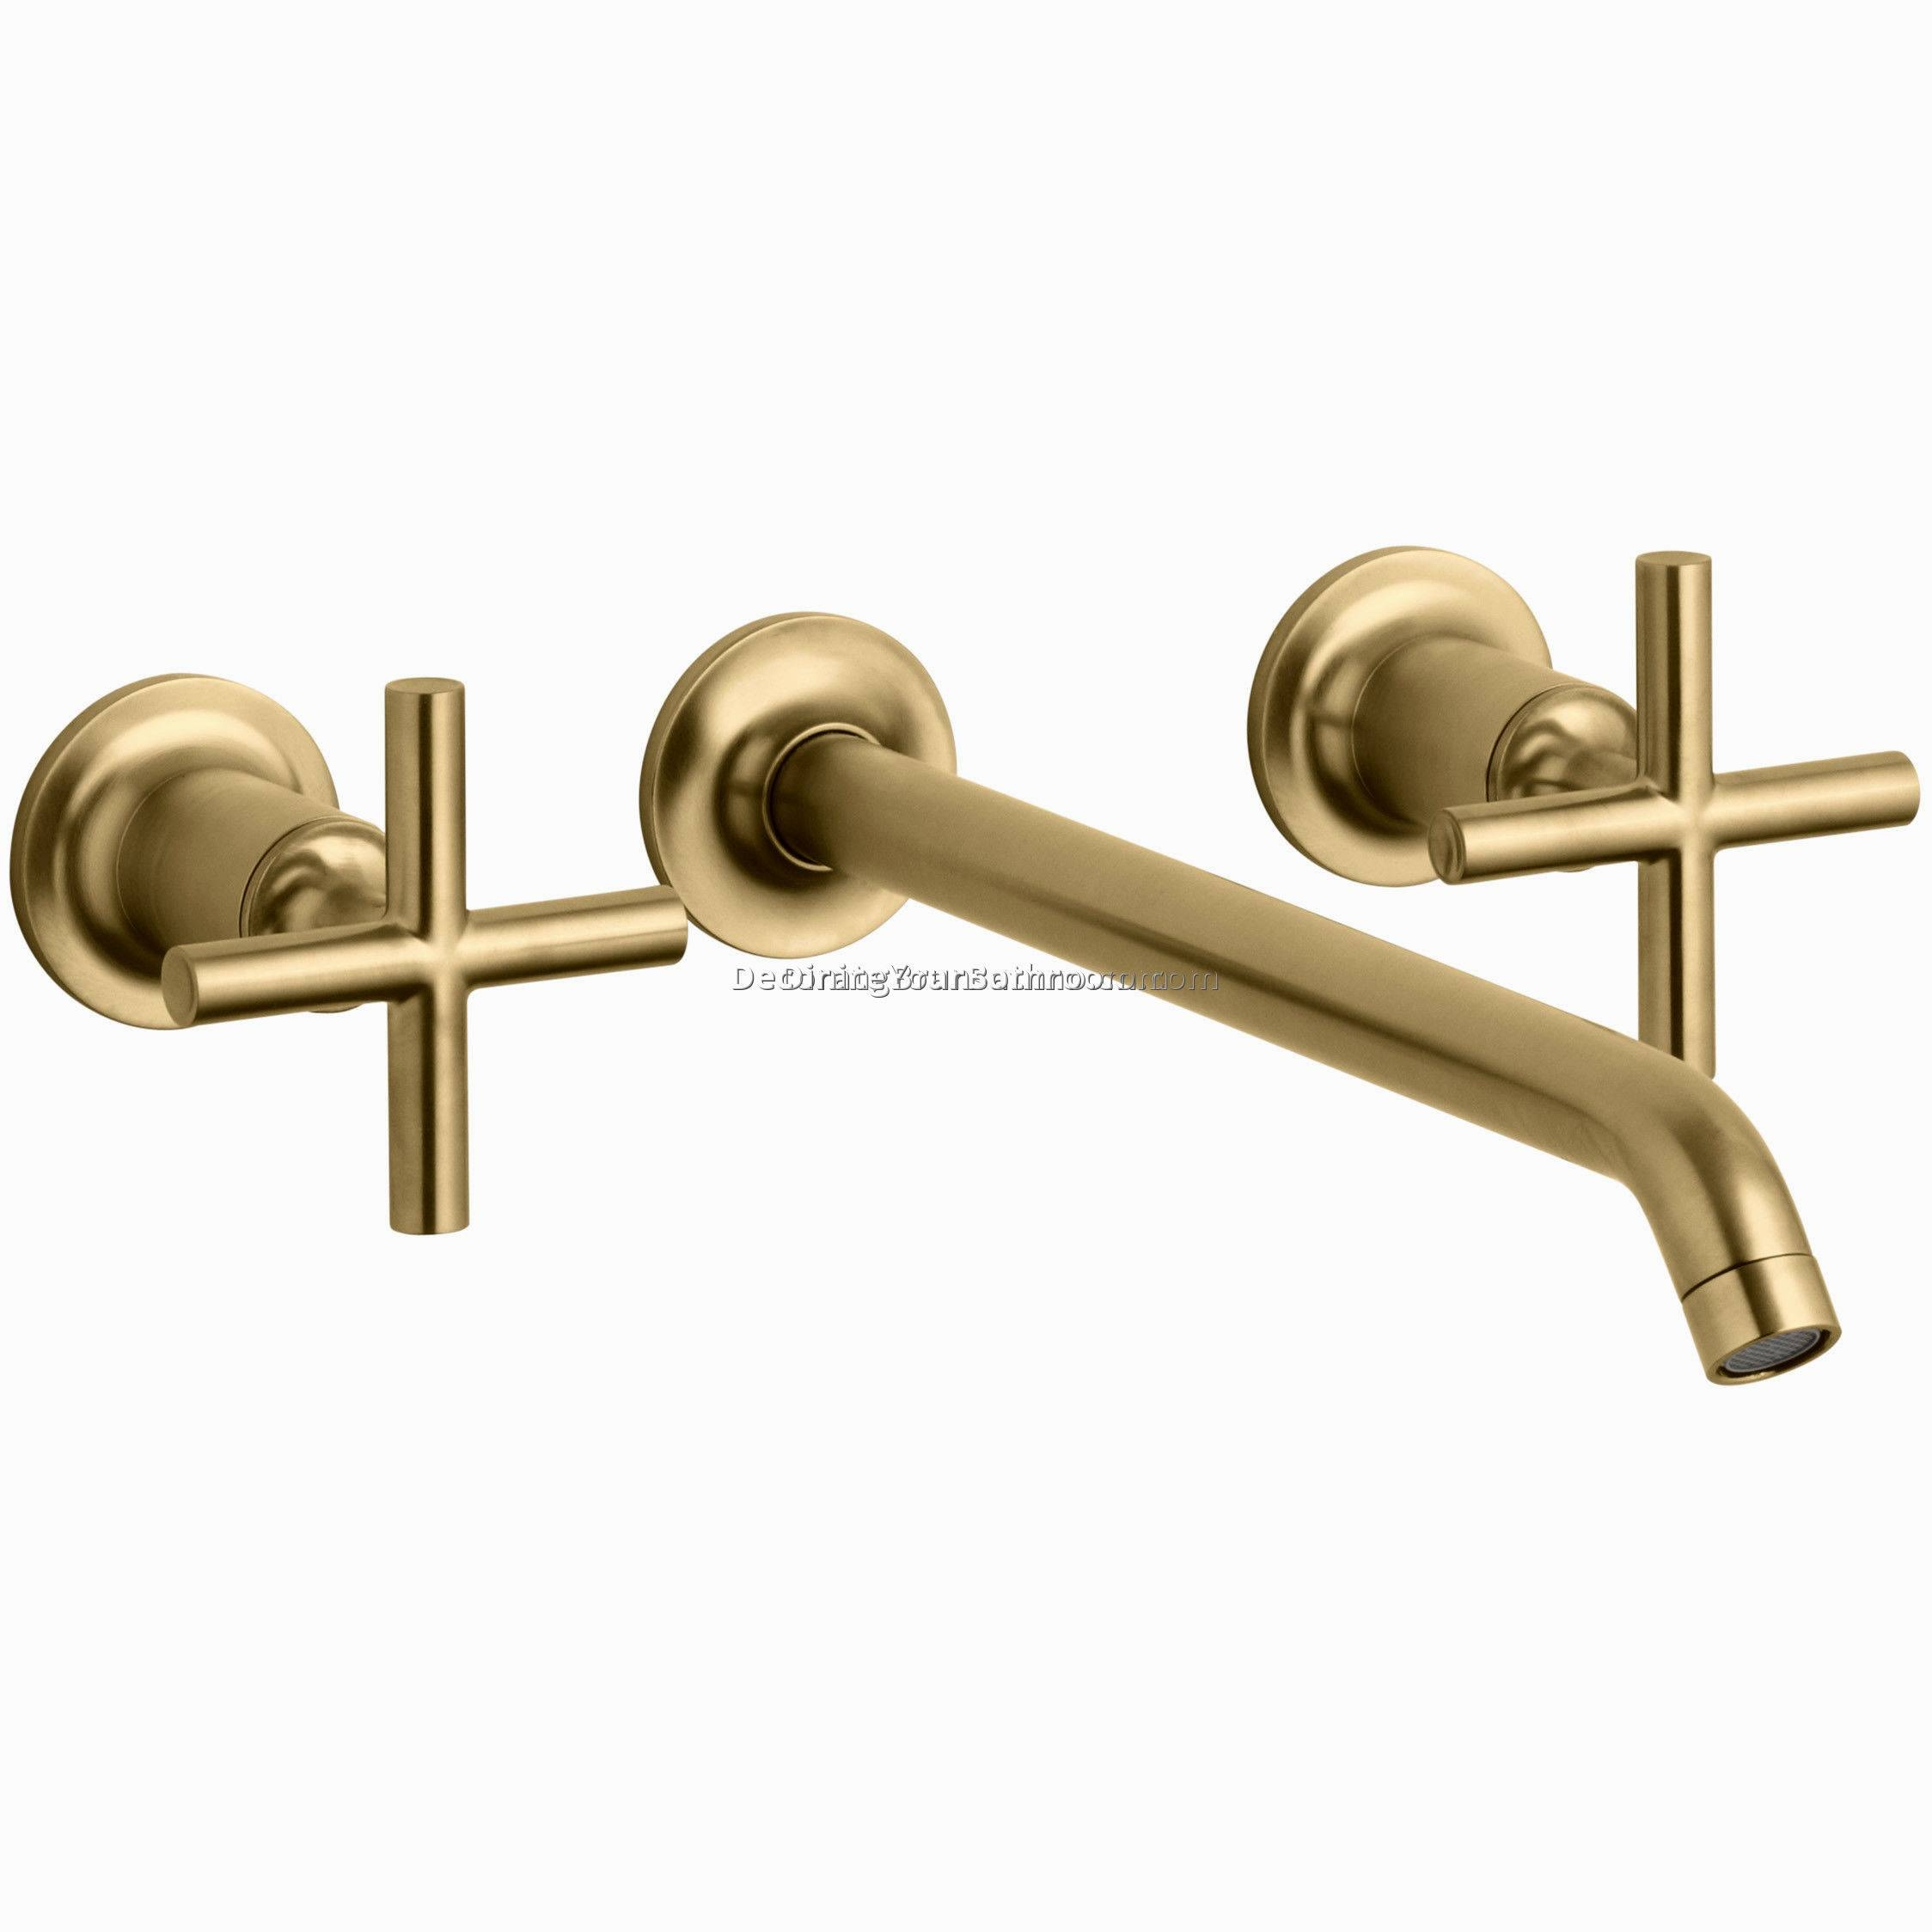 Ideas, kitchen sinks gold kitchen sink faucets elkay lk 126 faucet hole for measurements 2248 x 2248  .